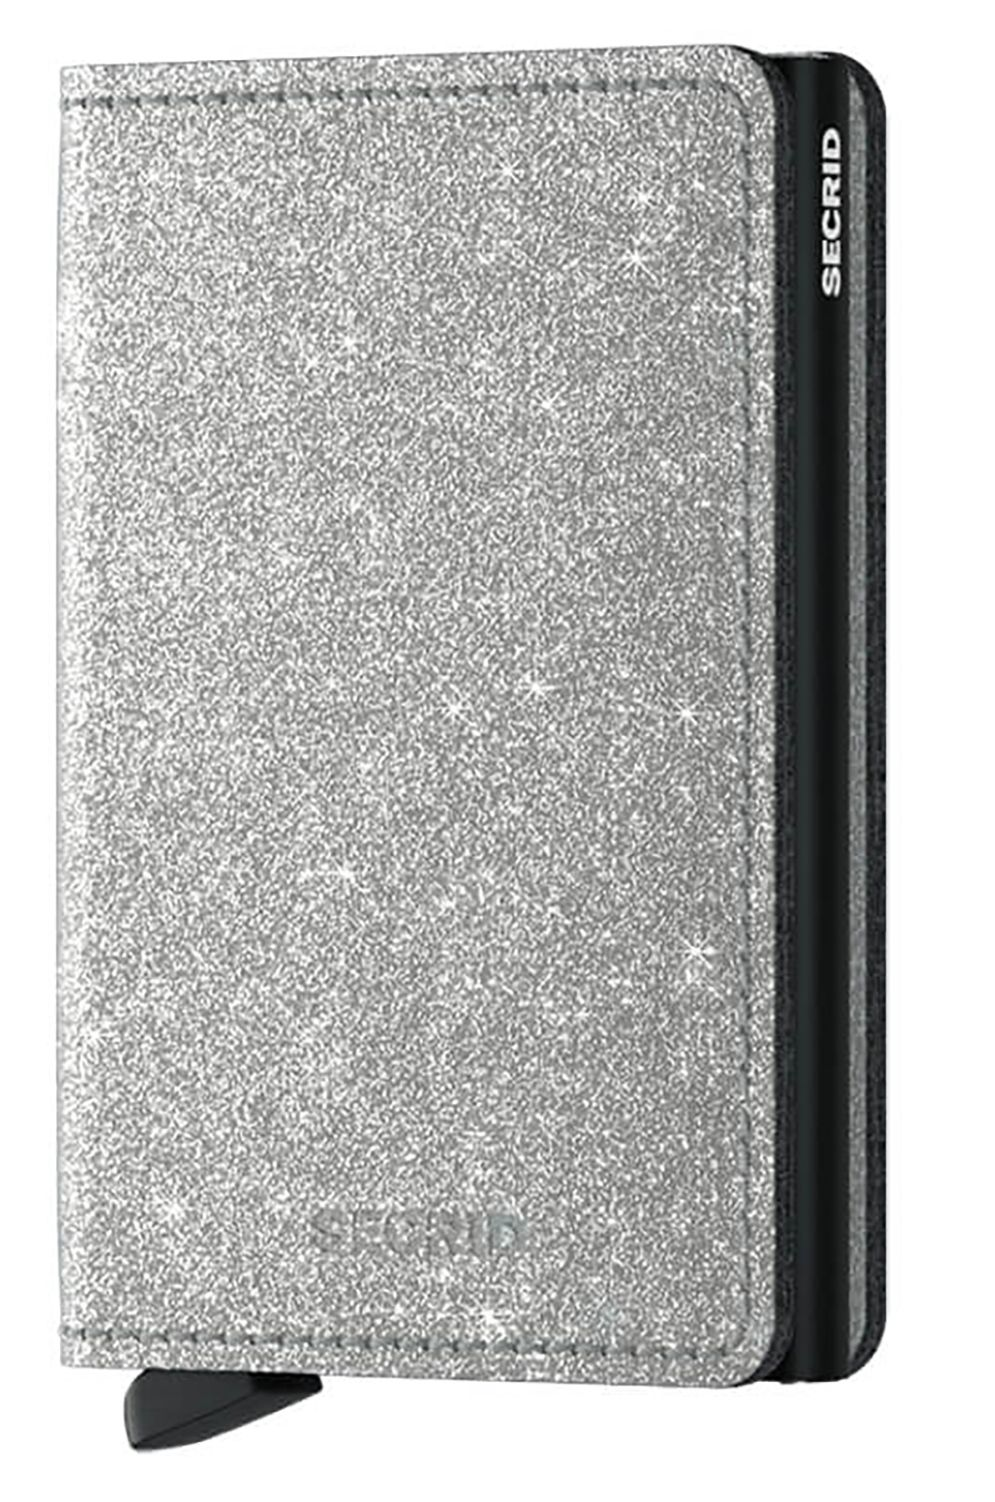 Secrid Leather Wallet SLIMWALLET CRYSTALLINE Silver